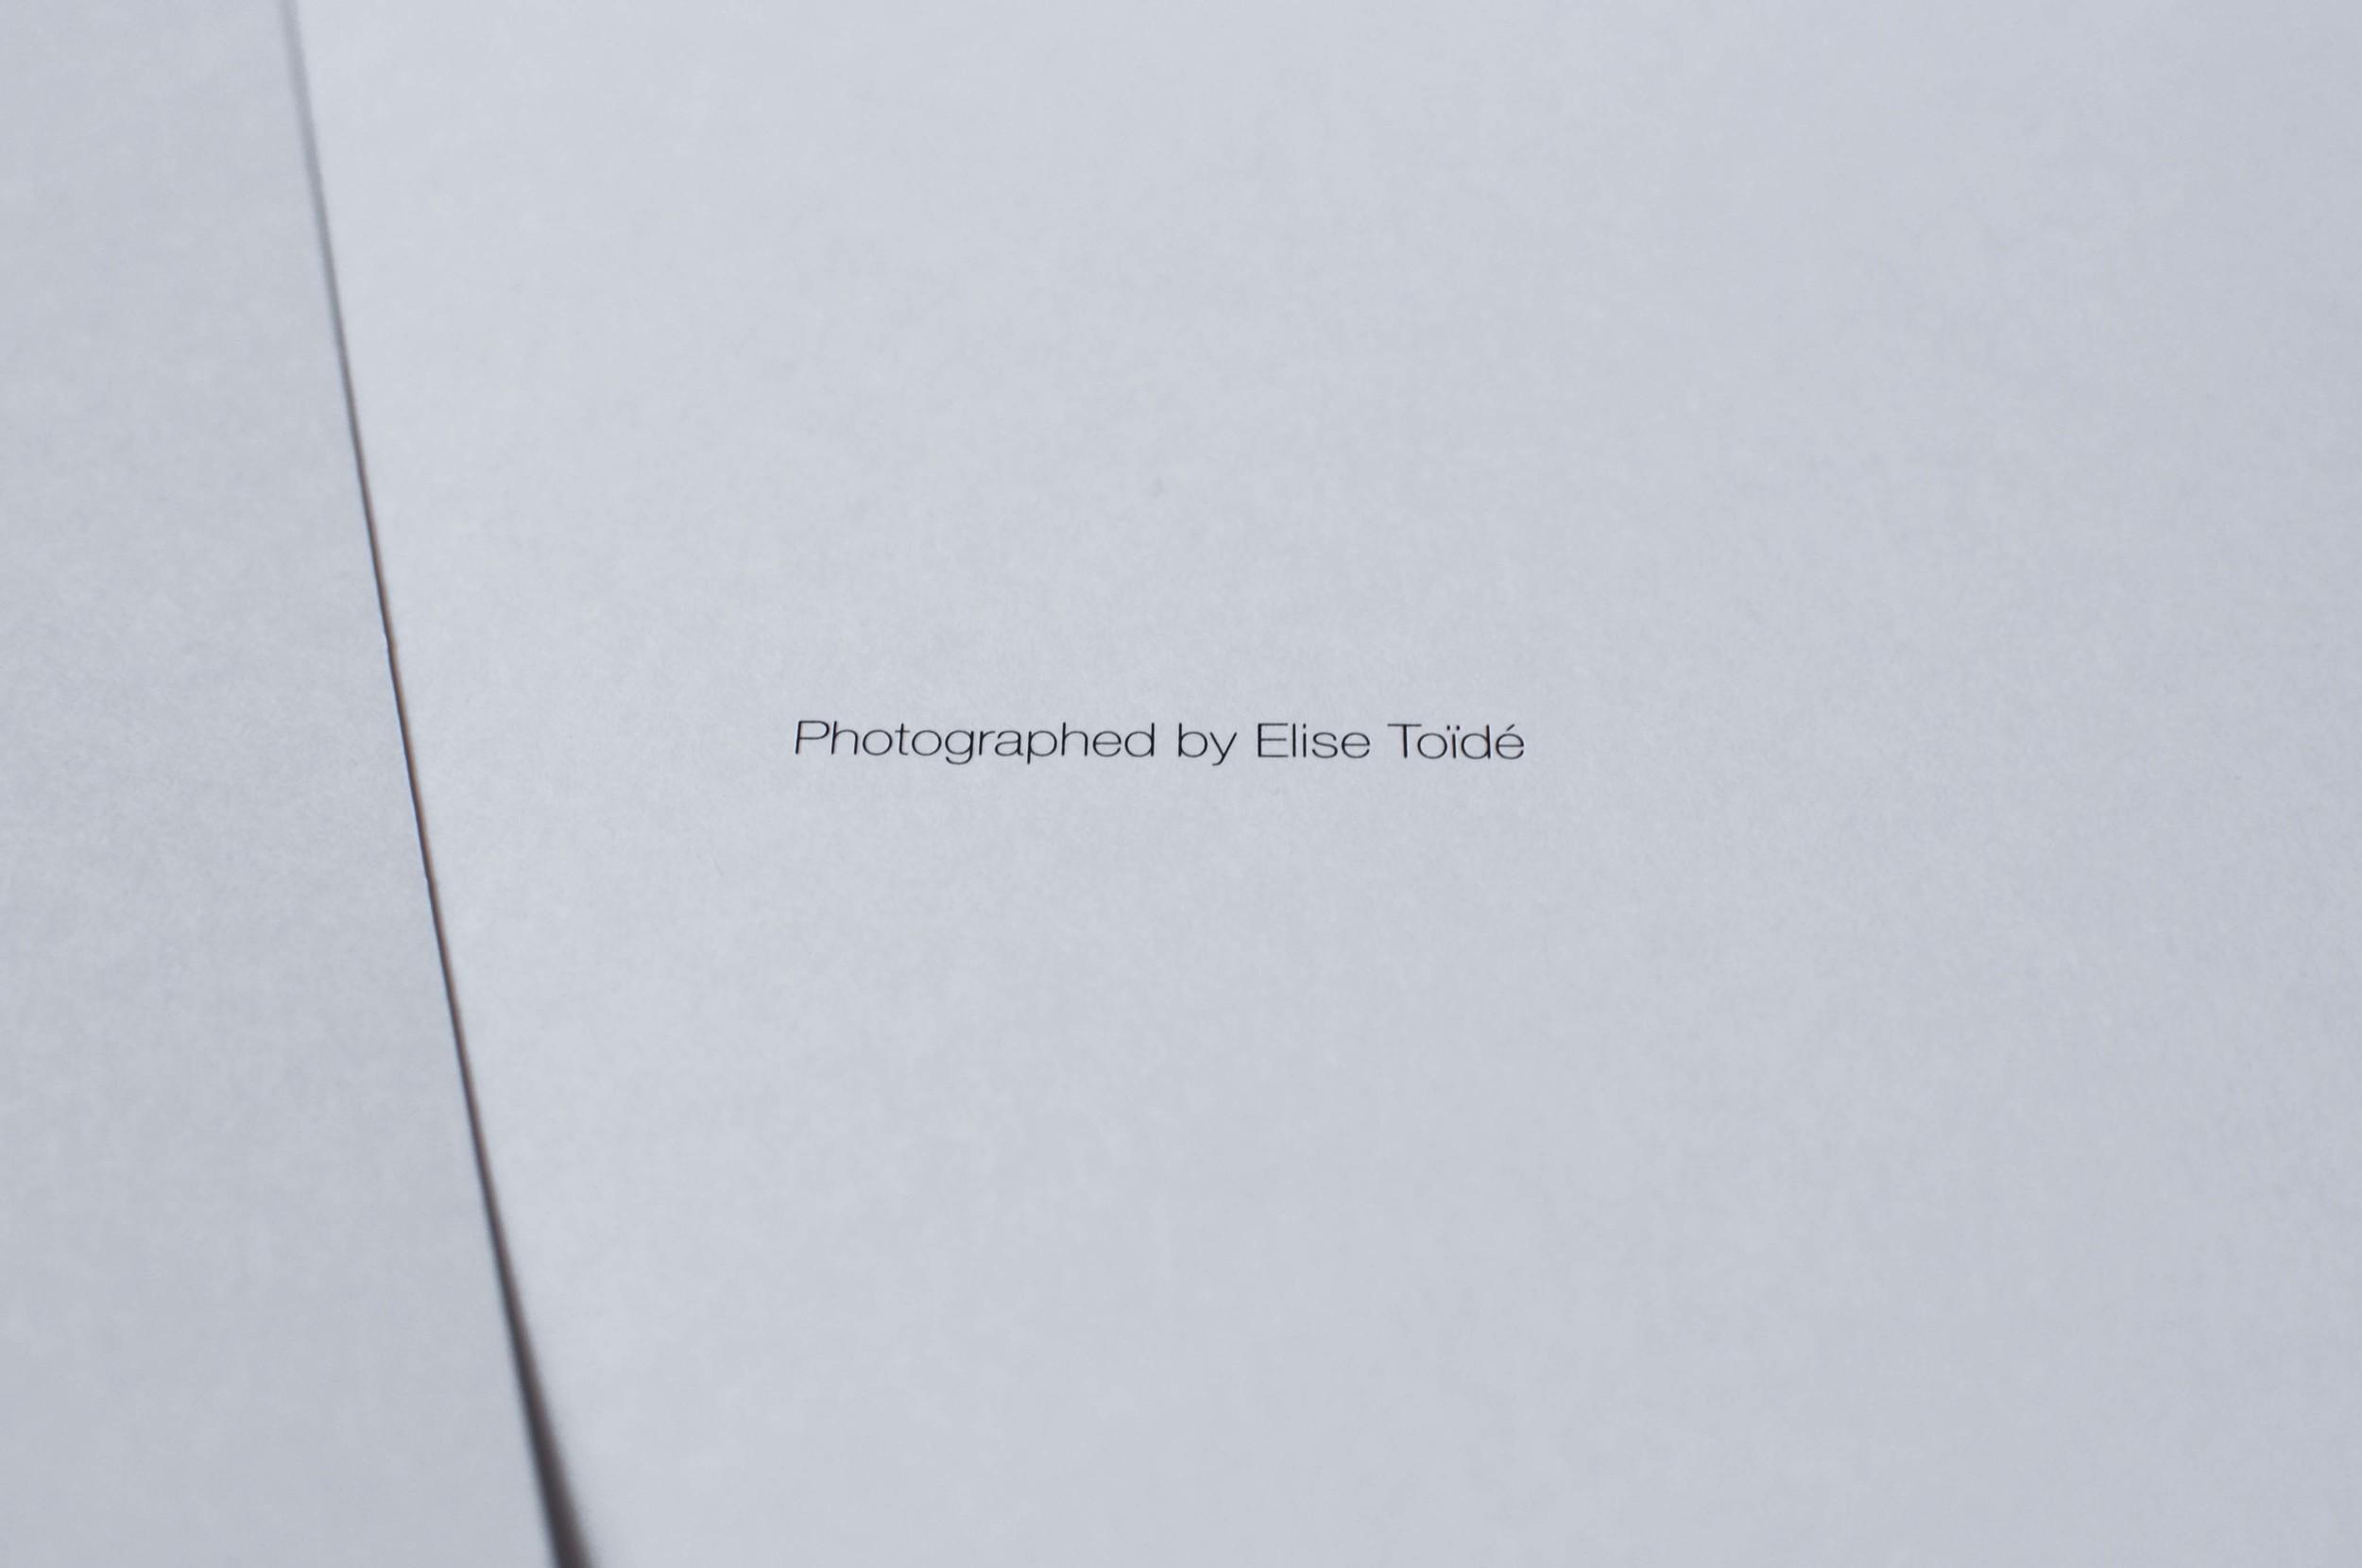 yohji yamamoto folio book by elise toide photography by natalia kuznetsova | S/TUDIO